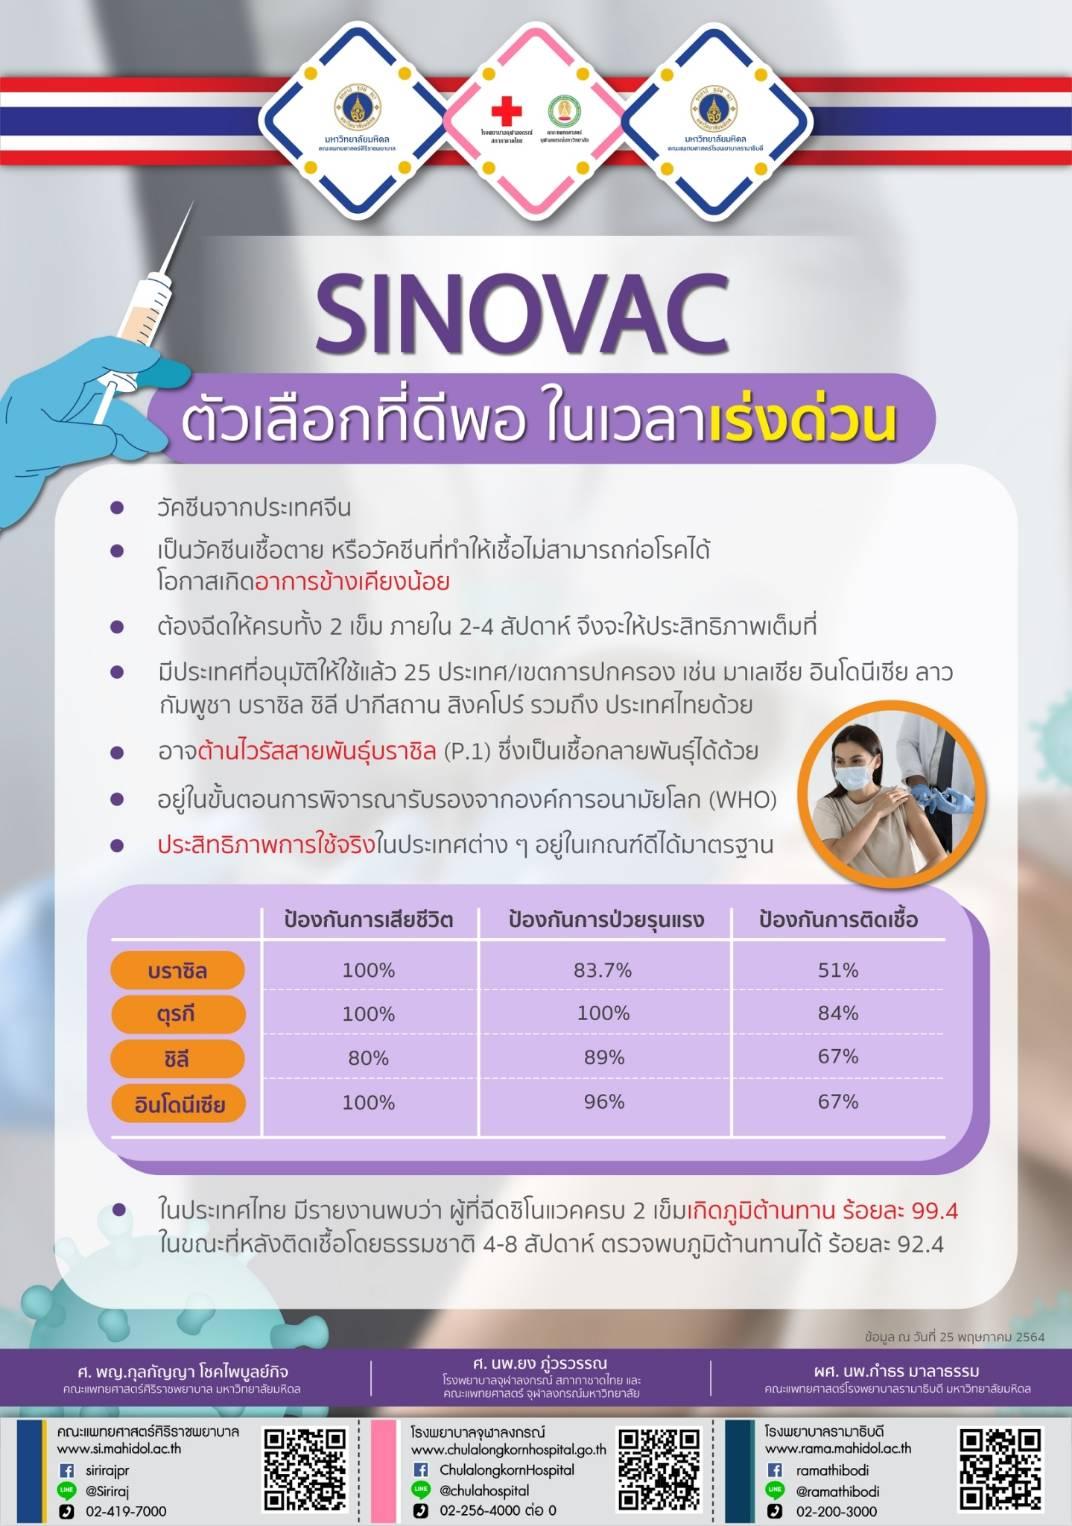 SINOVAC ตัวเลือกที่ดีพอ ในเวลาเร่งด่วน